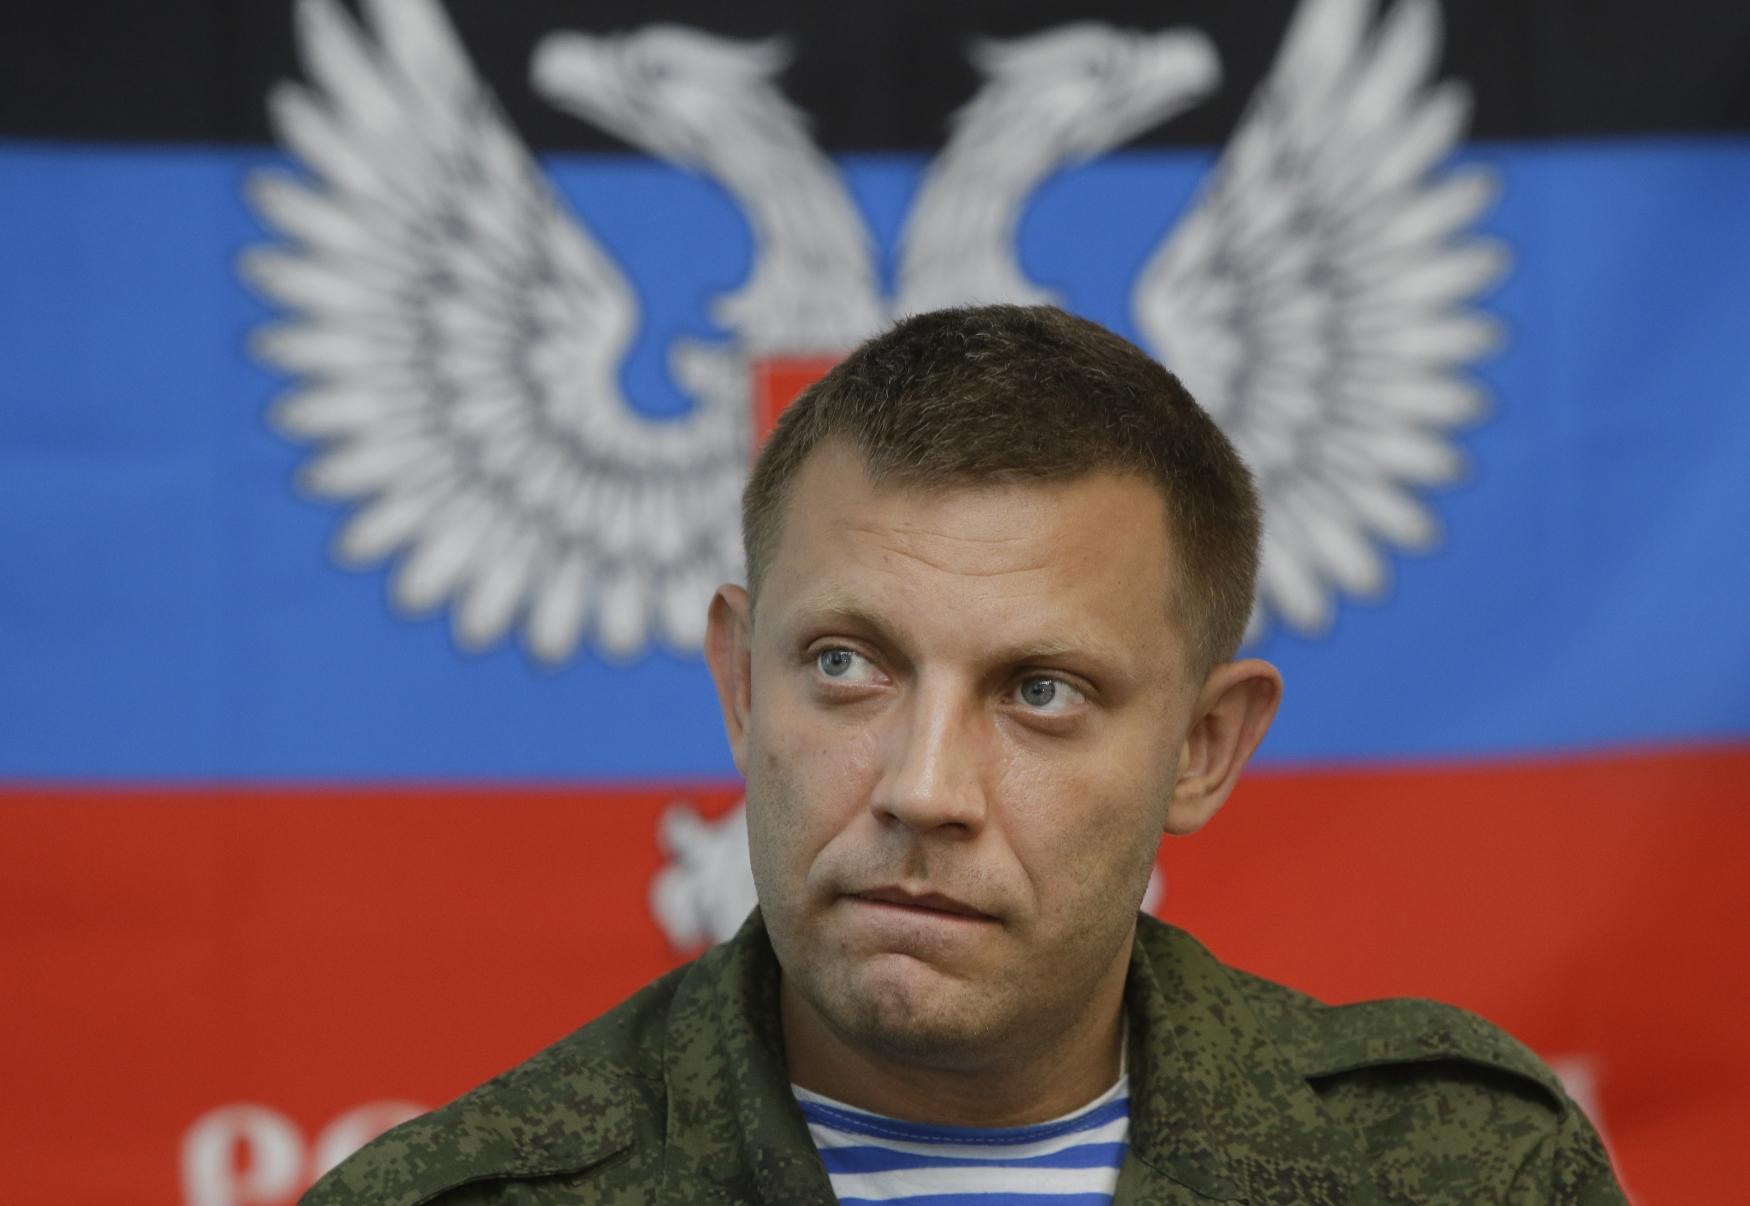 Alexandr Zacharčenko (v roce 2014)